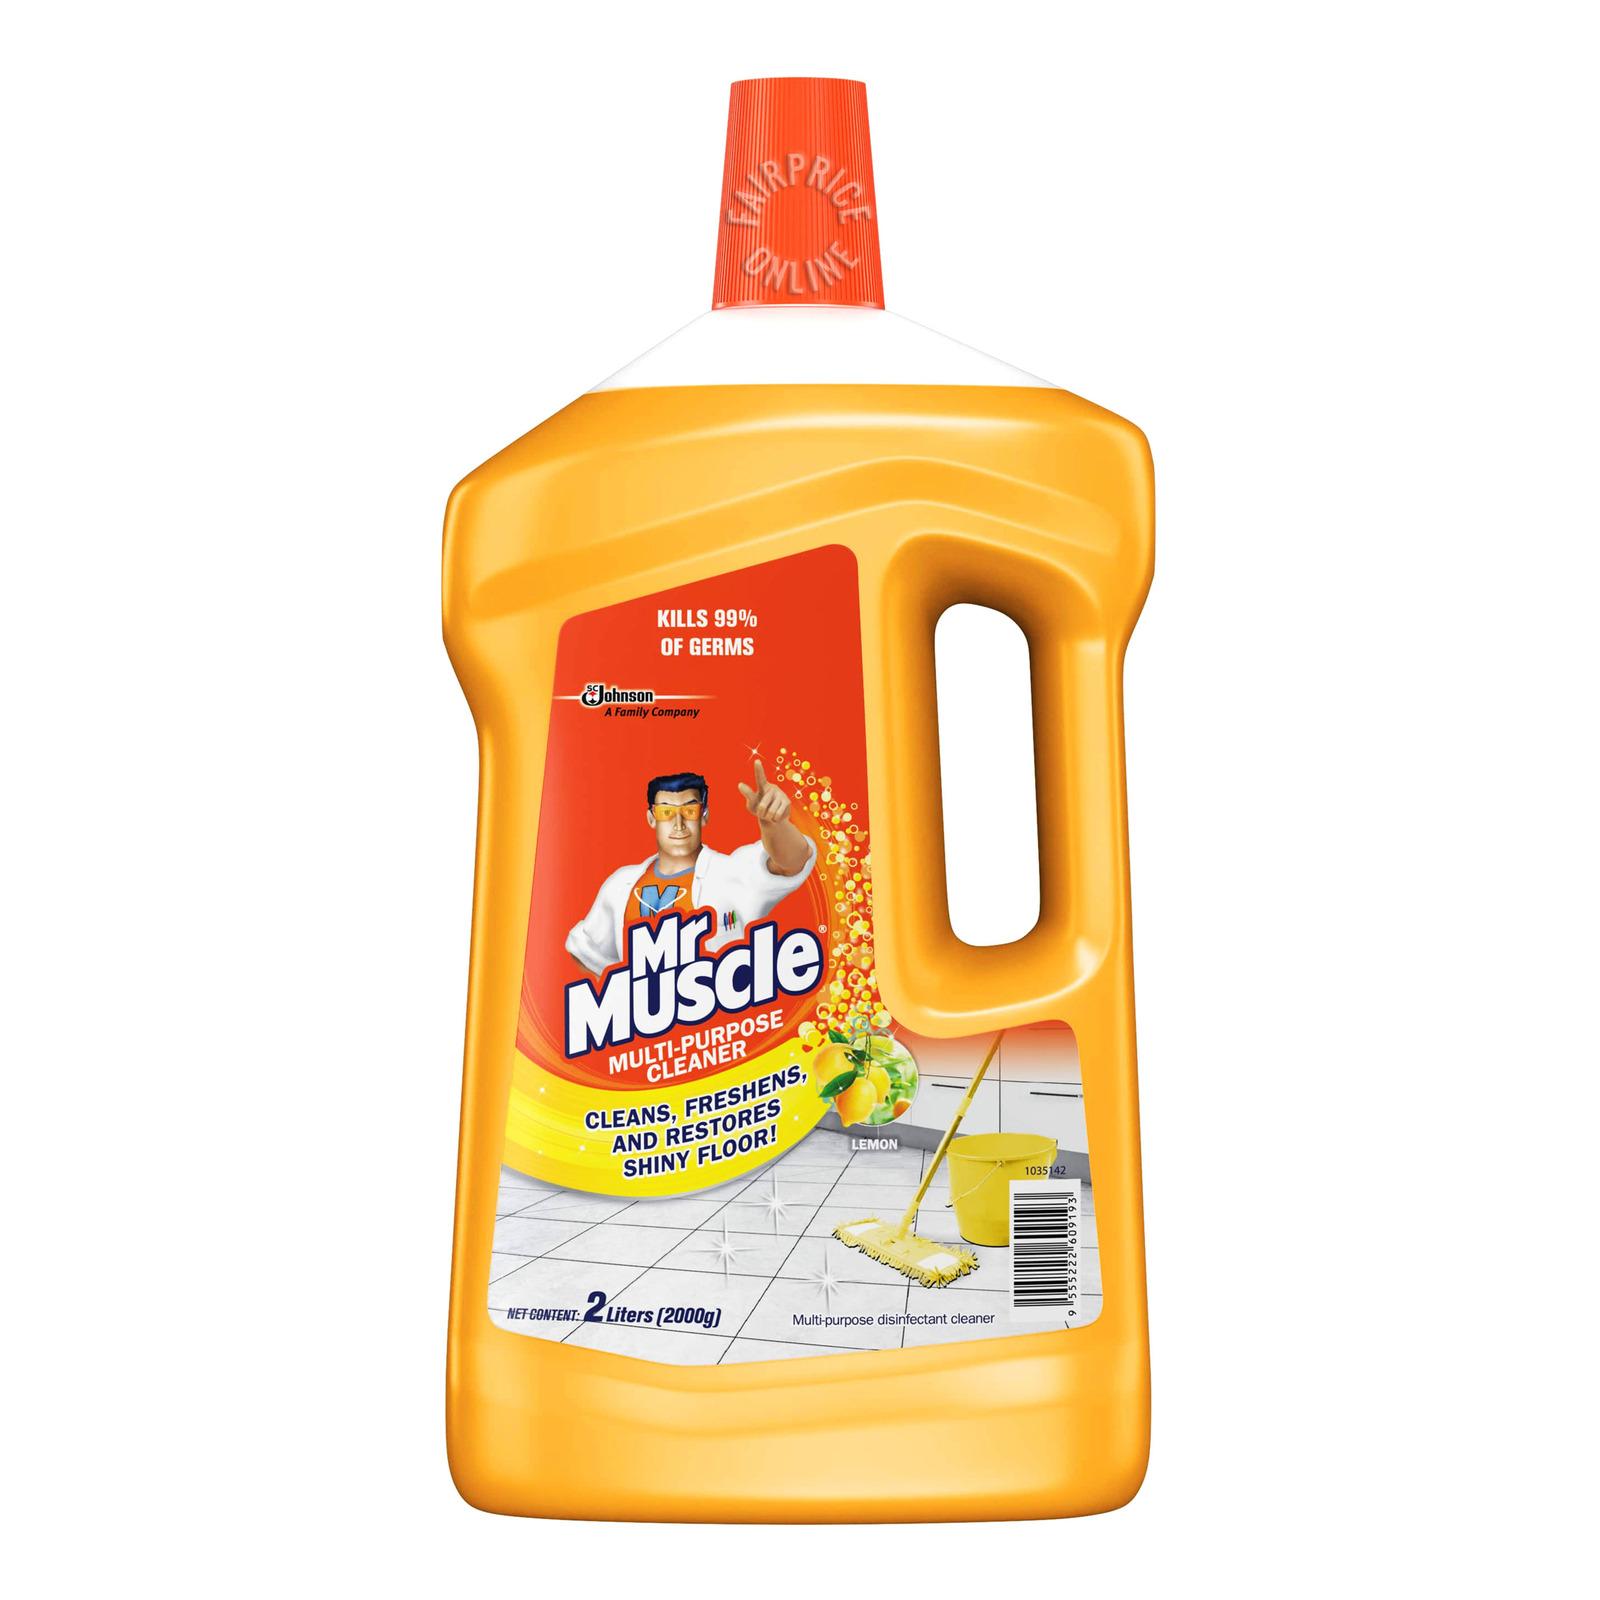 Mr Muscle 5 in 1 Multi-Purpose Cleaner - Lemon